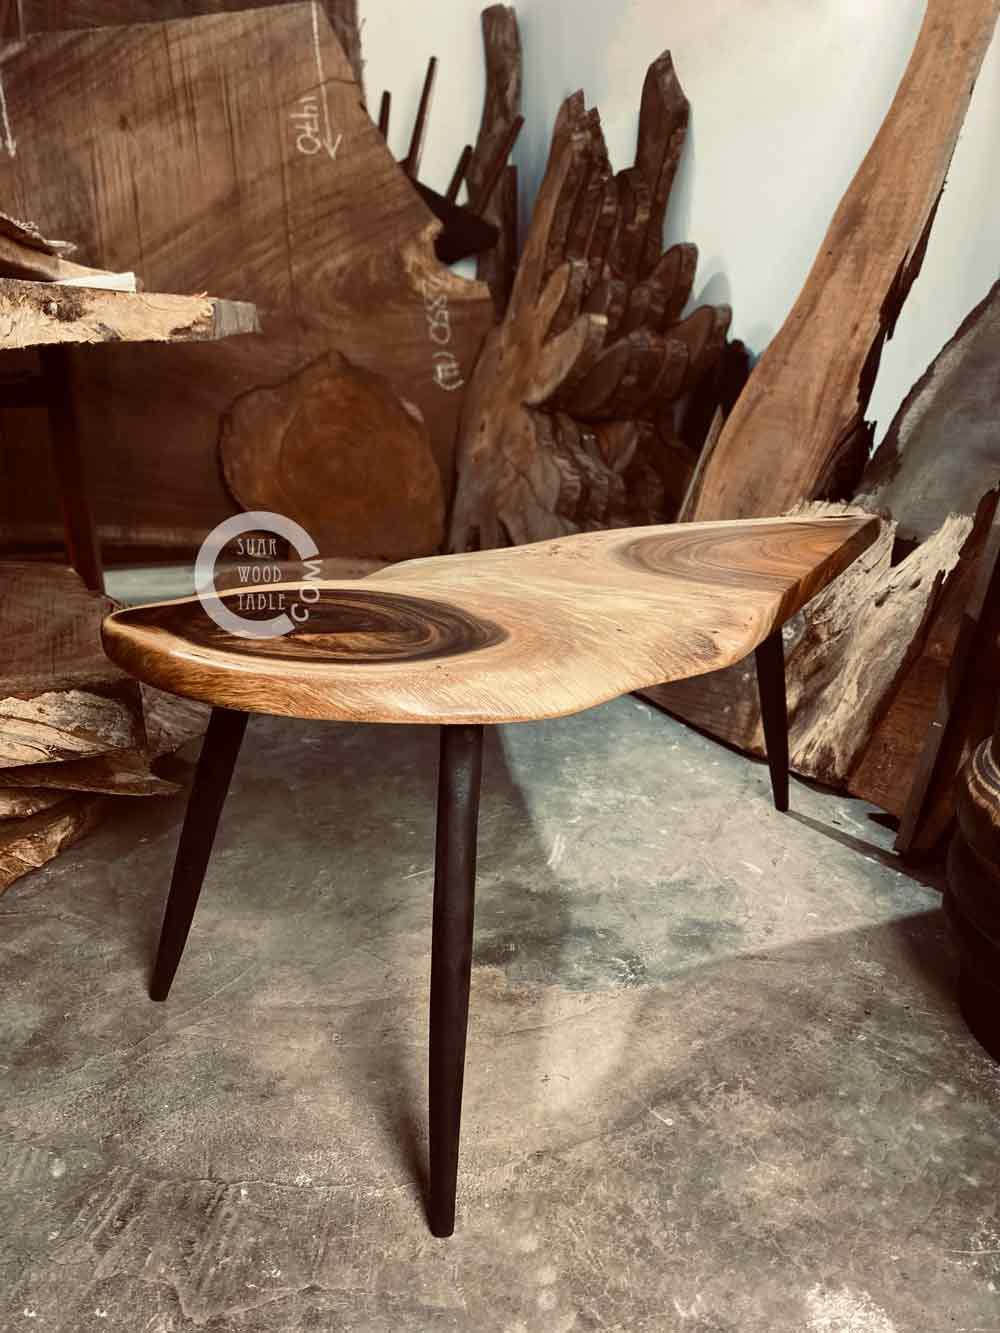 suar wood coffee table with charred leg